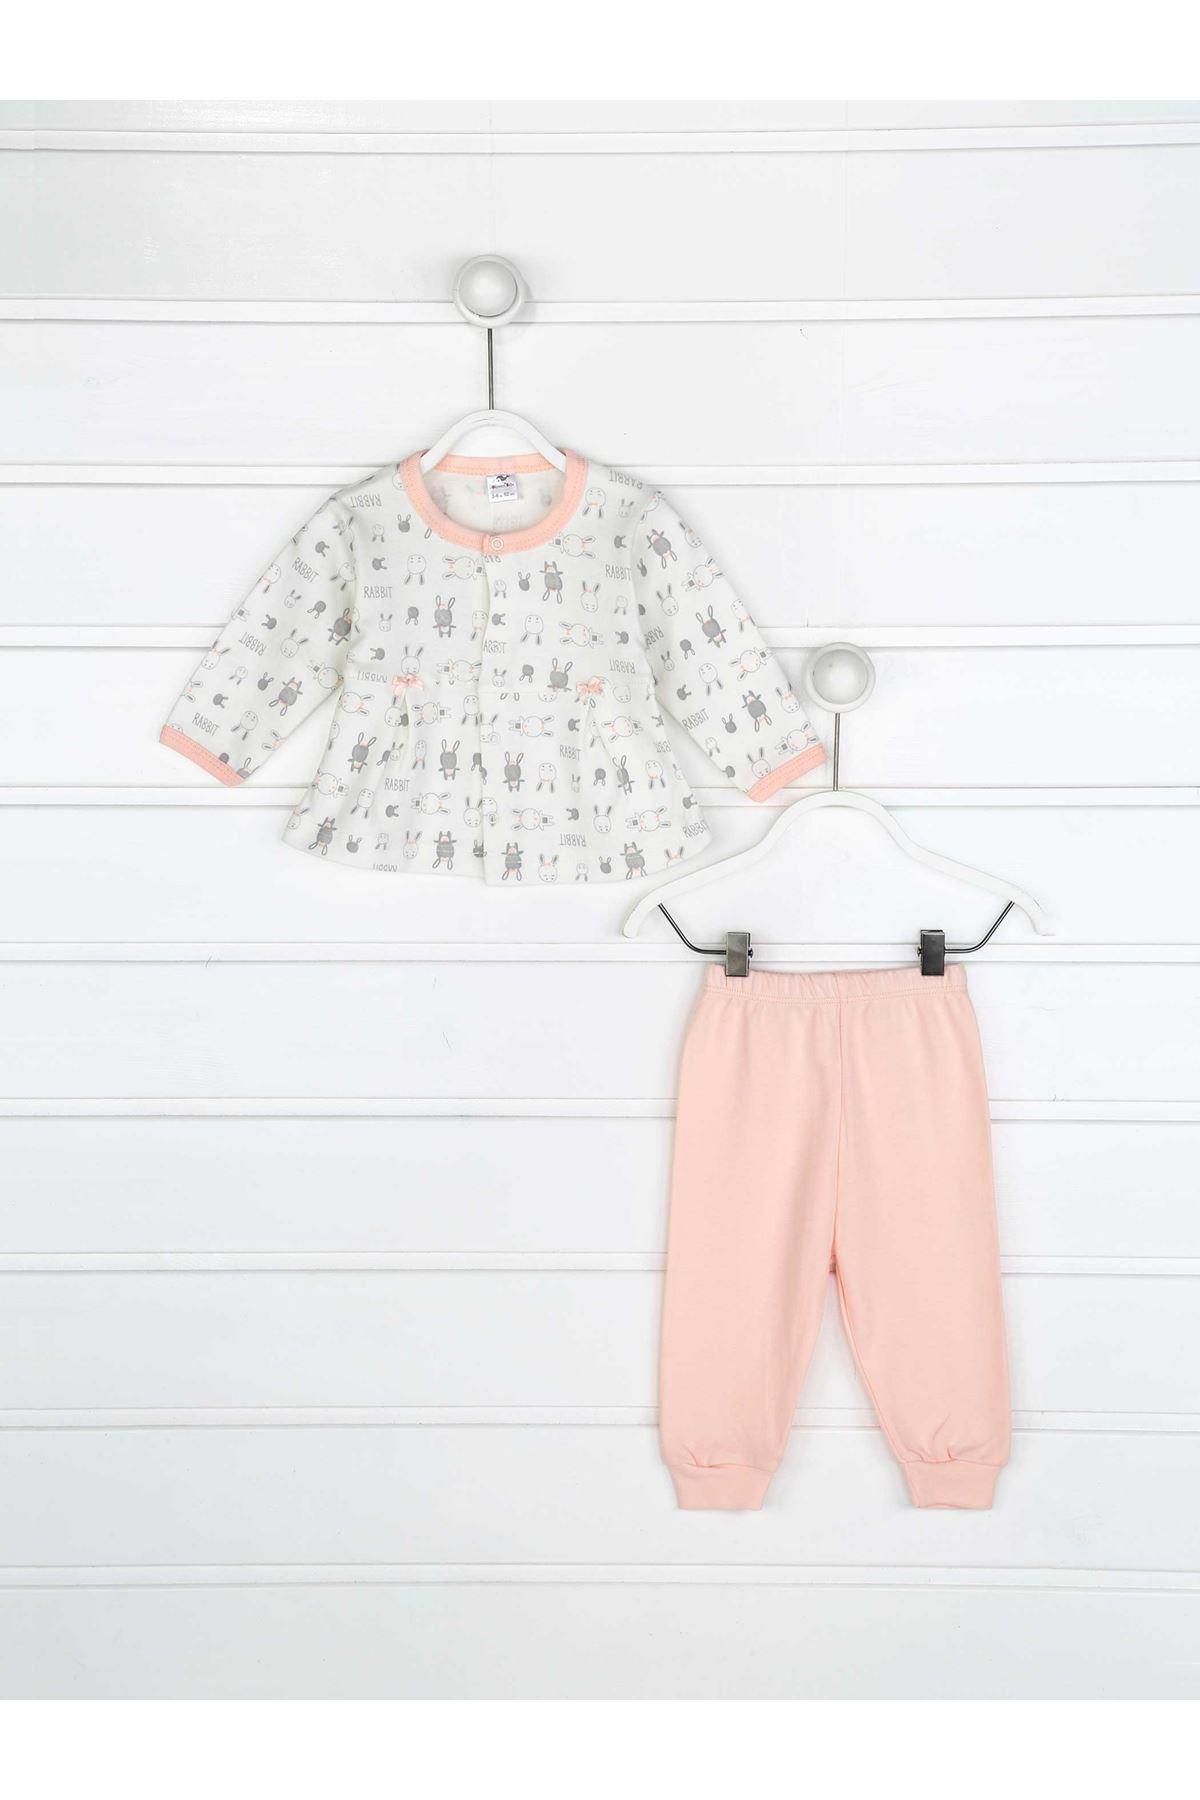 Powder Baby Girl 2 Piece Suit